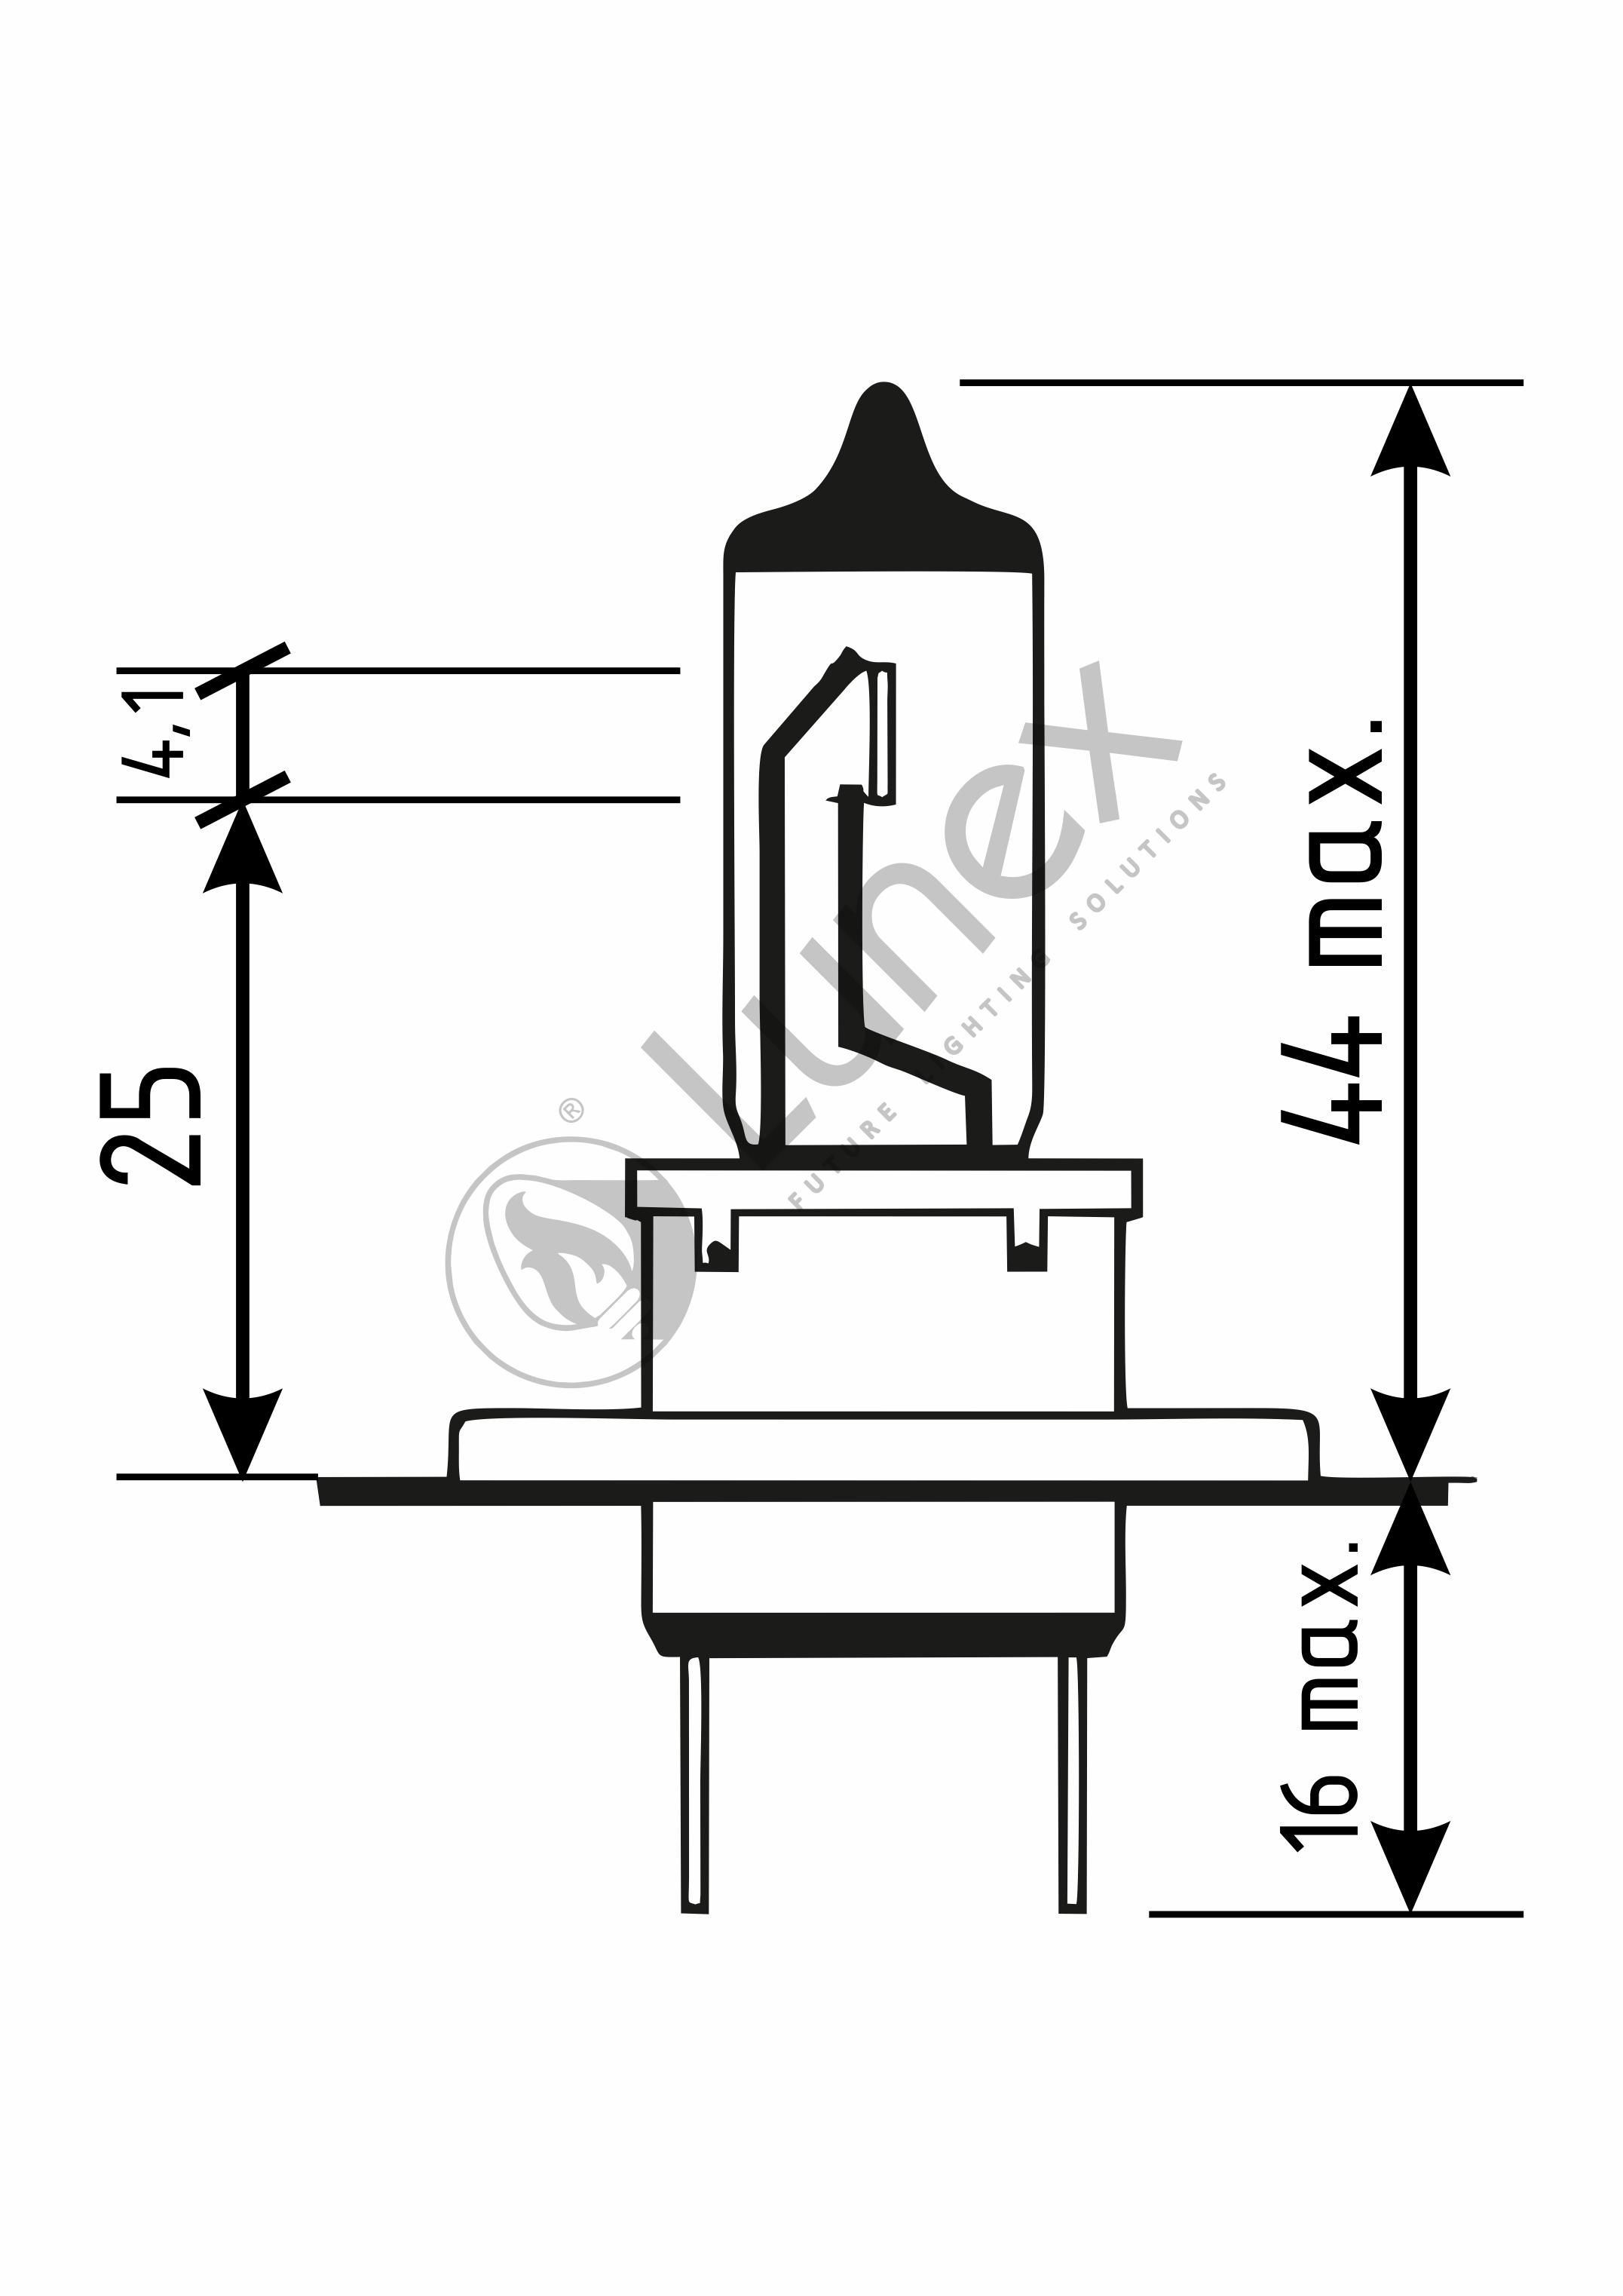 2 X H7 Halogen Headlamp Bulb Premium 477 12v 55w Lunex Long Life K